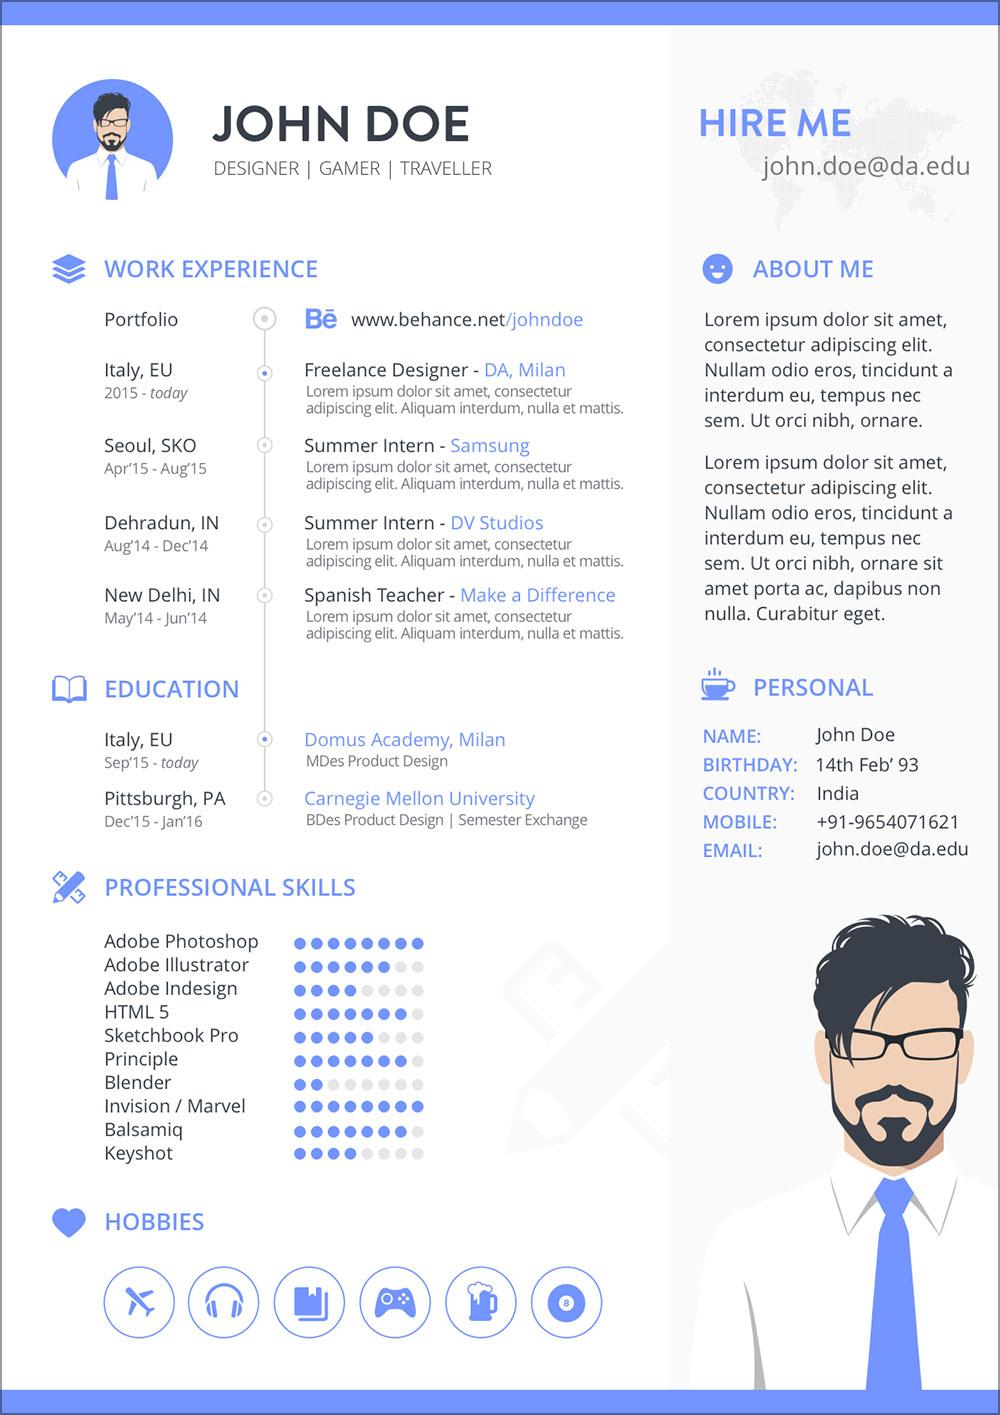 Free-Resume-Template-in-Sketch-for-Gamer-&-Designer-2